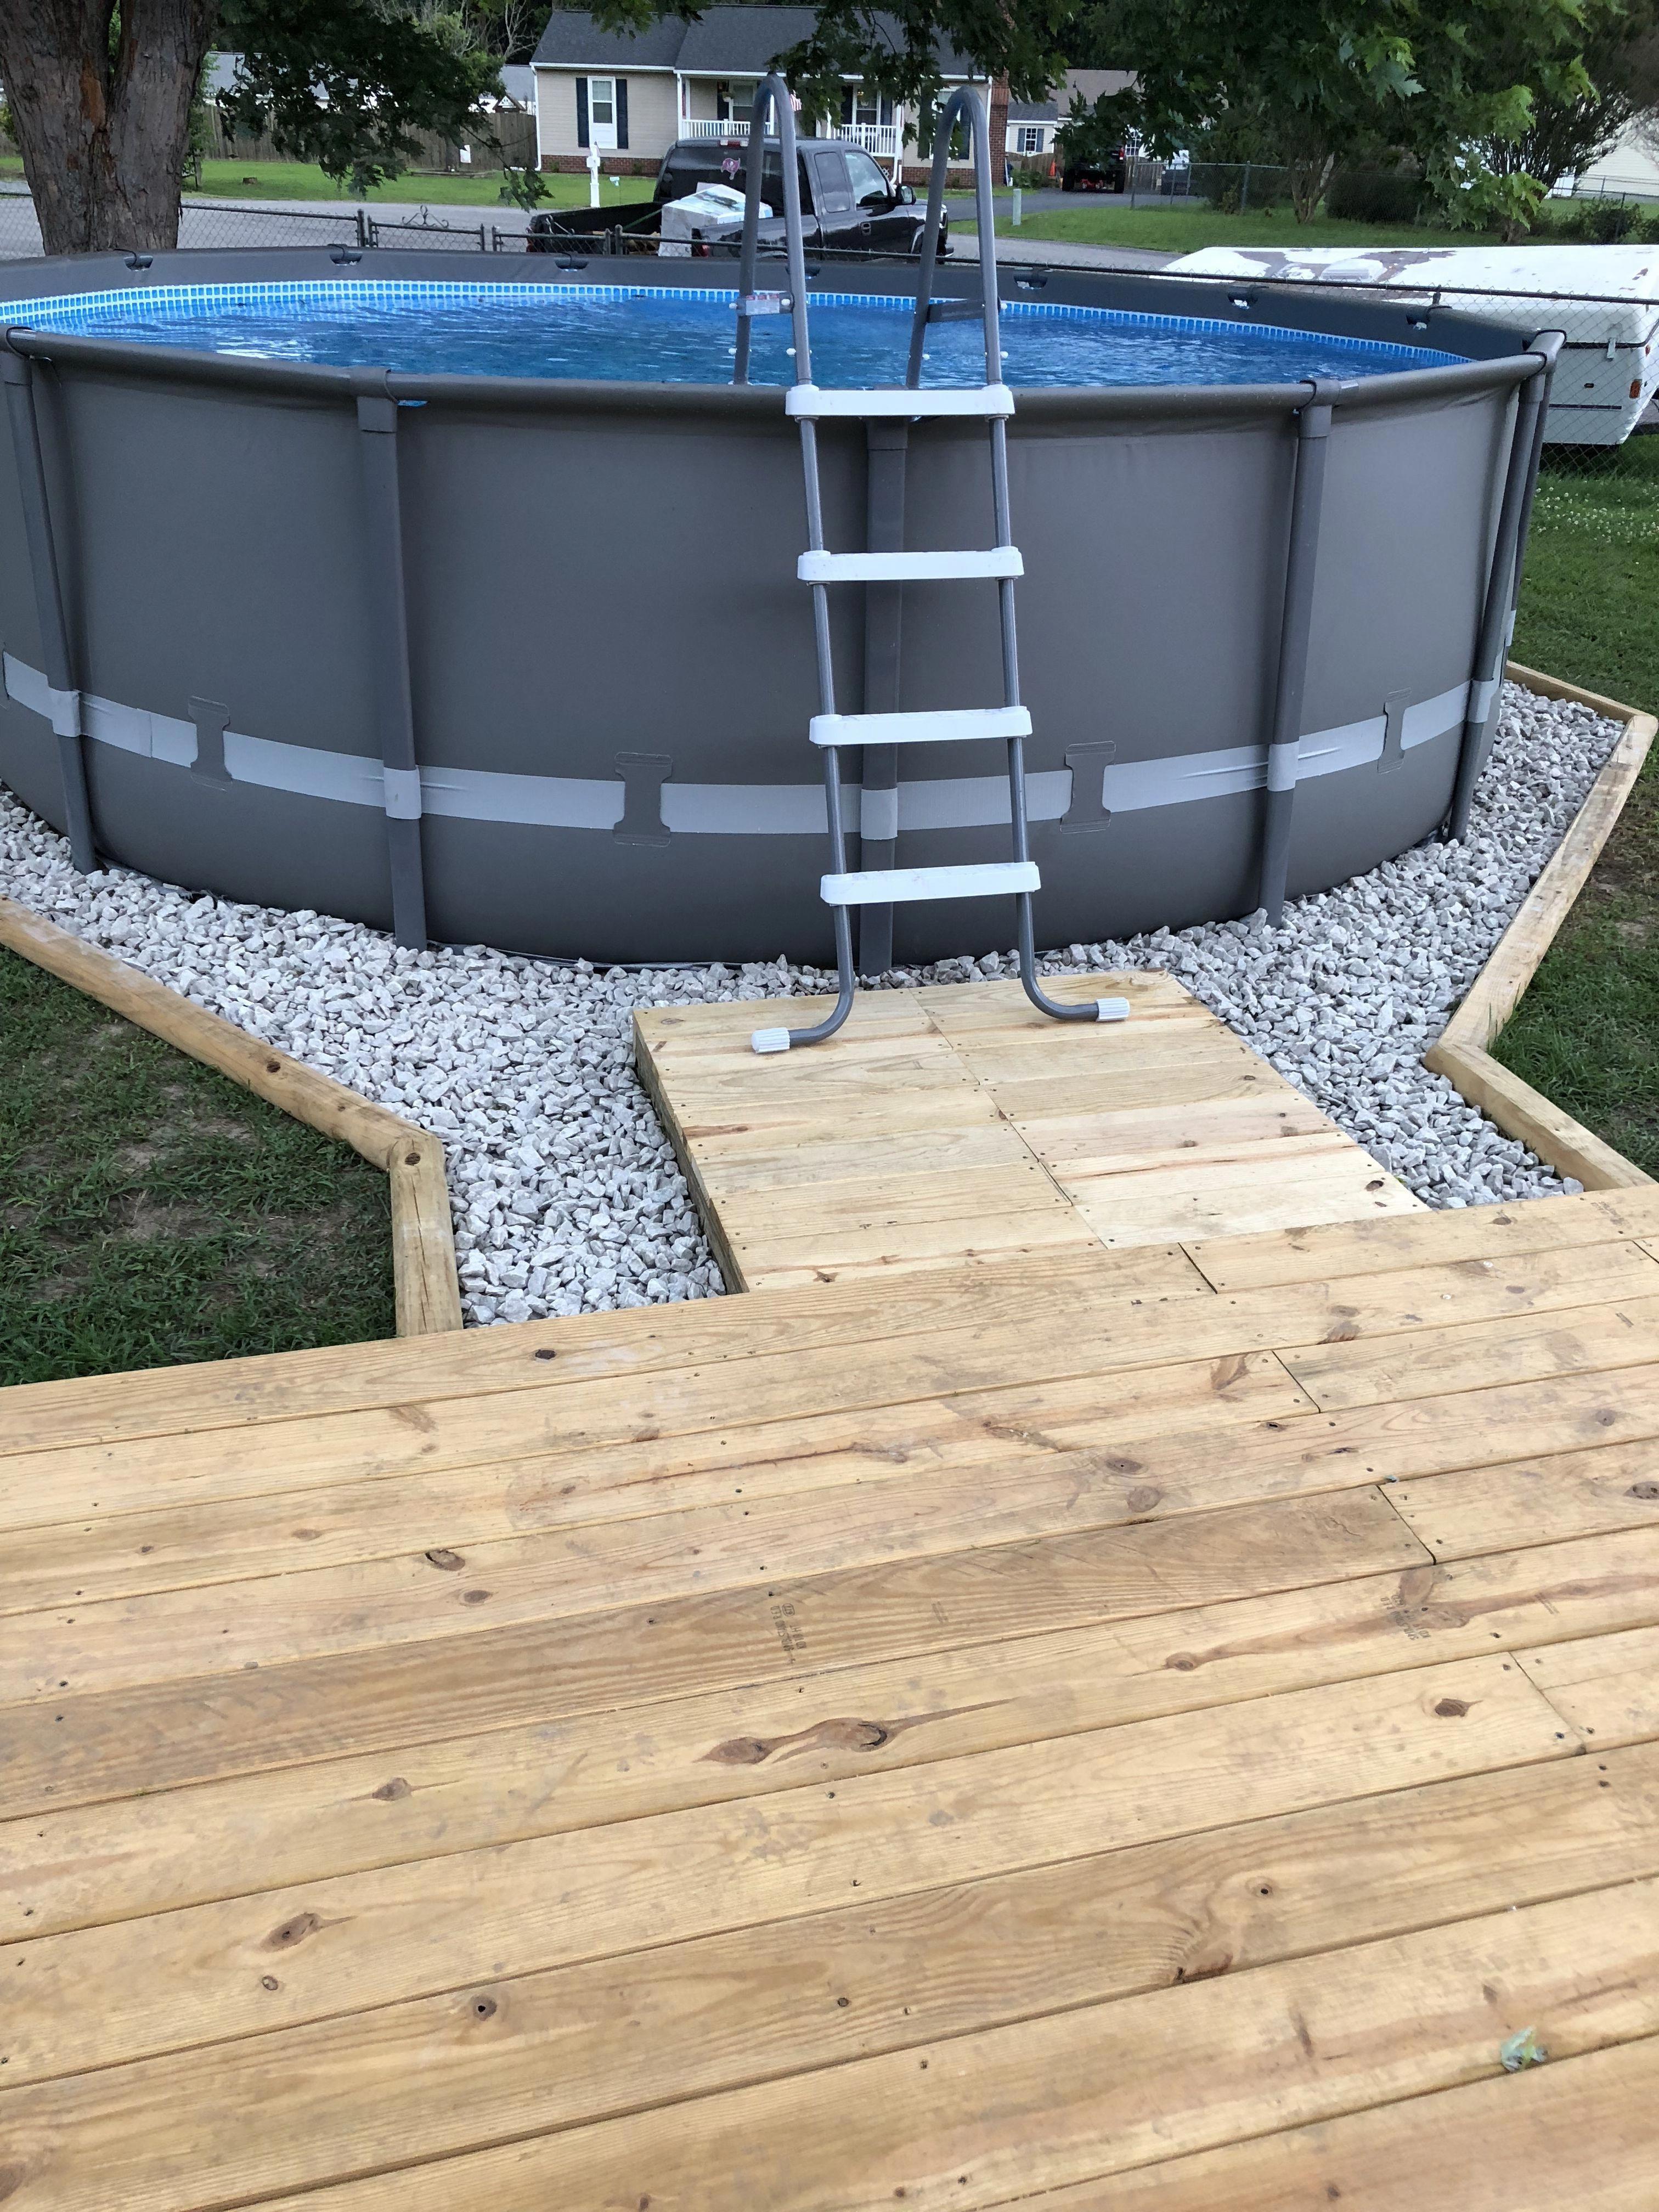 Our intex pool landscape project 😍 #PoolLandscapingIdeas ...